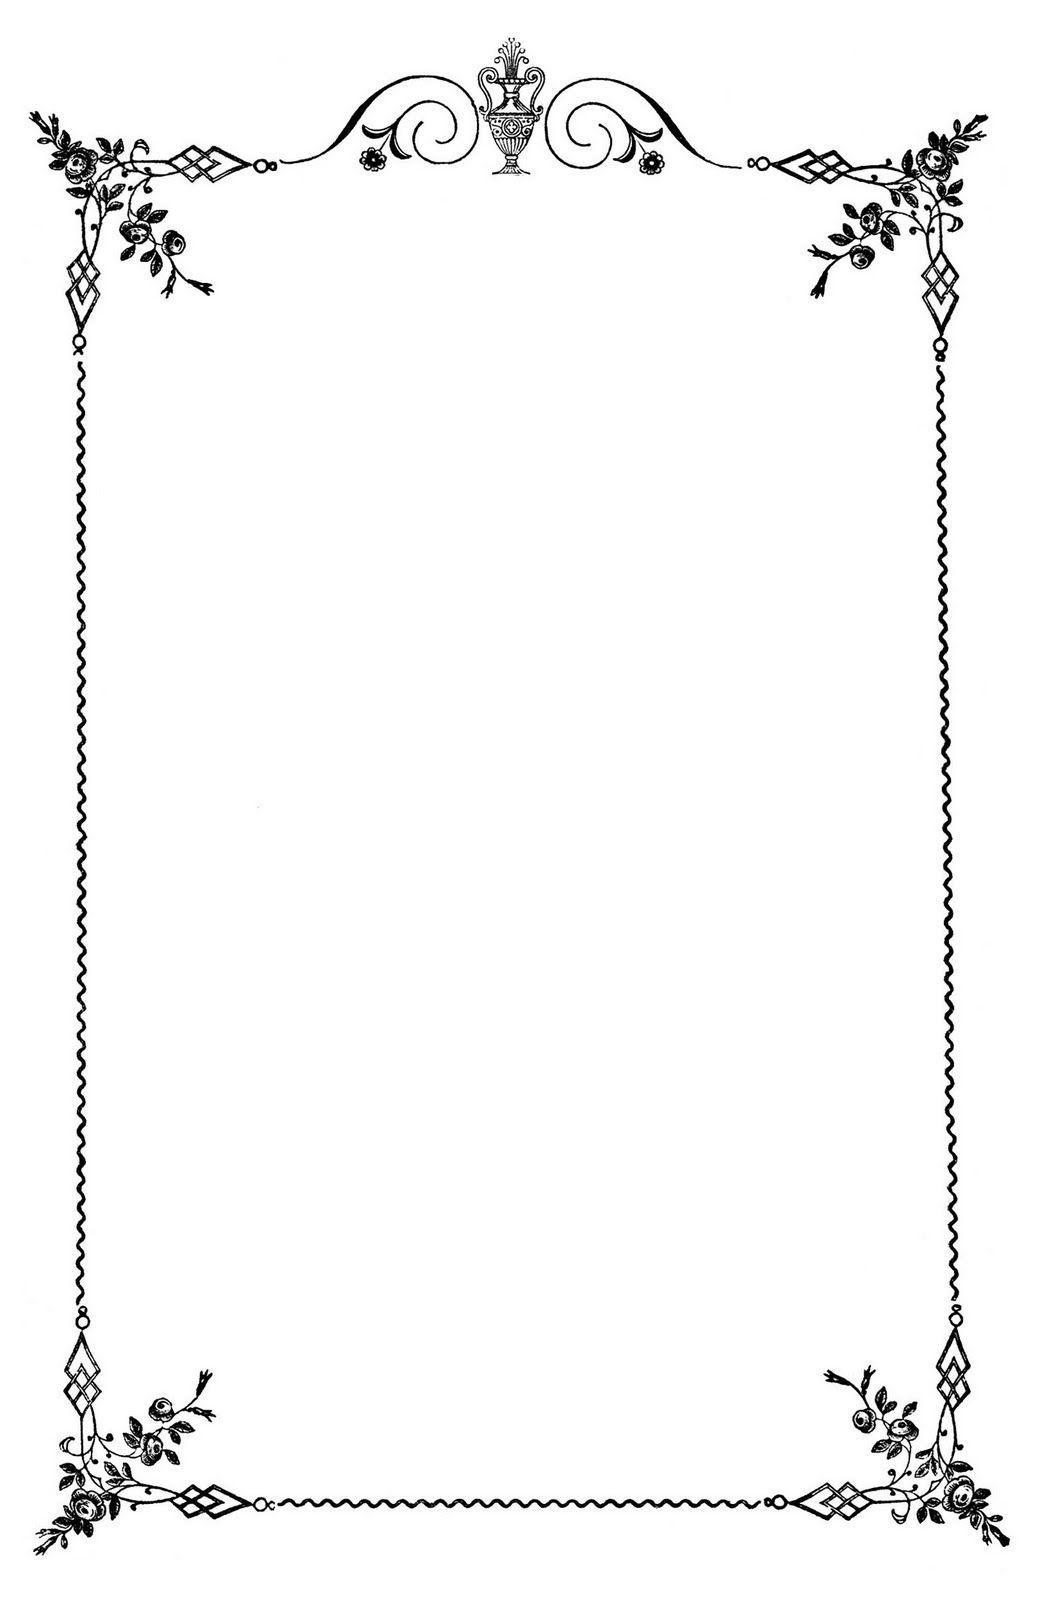 Decorative borders for microsoft word fancy page borders for microsoft - Free Frames Vintage Clip Art Elegant Frame Wedding Menus The Graphics Fairy